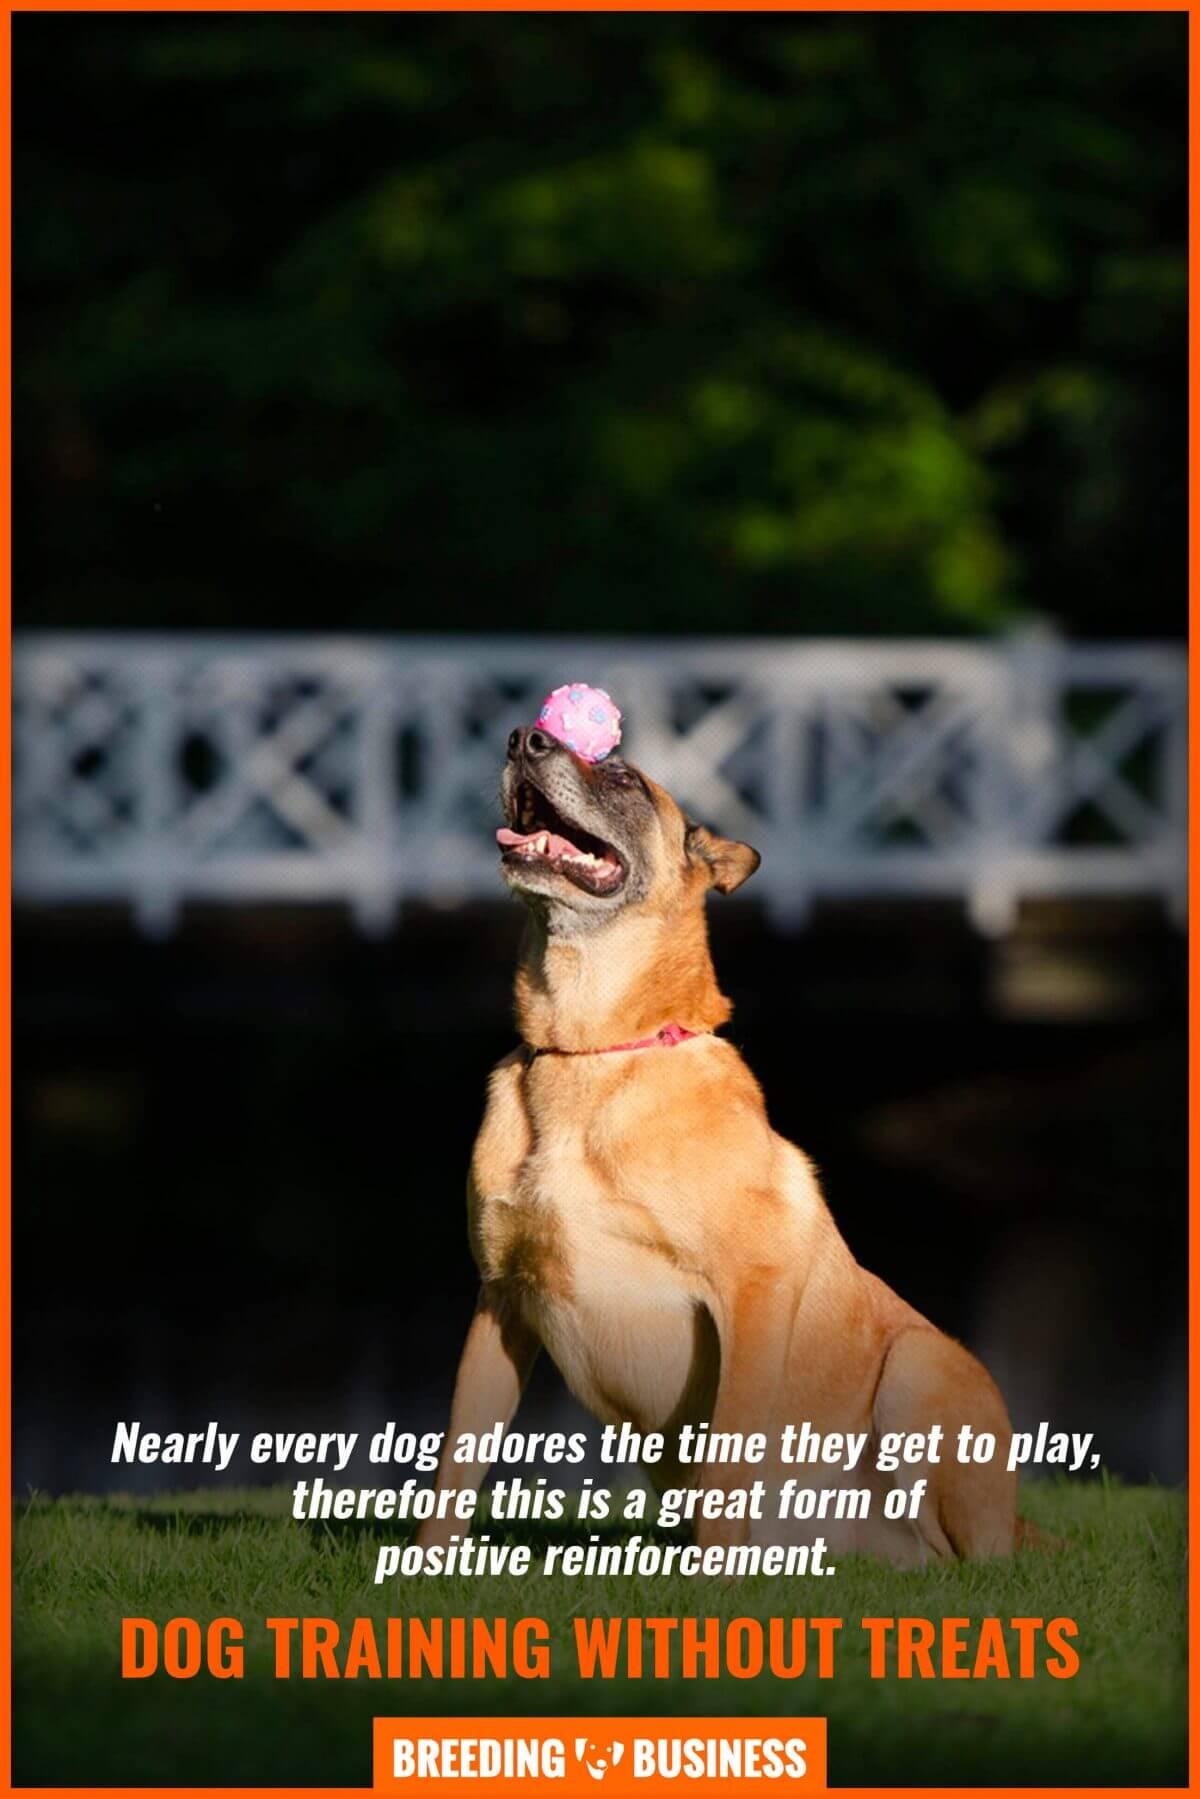 dog training using positive reinforcement